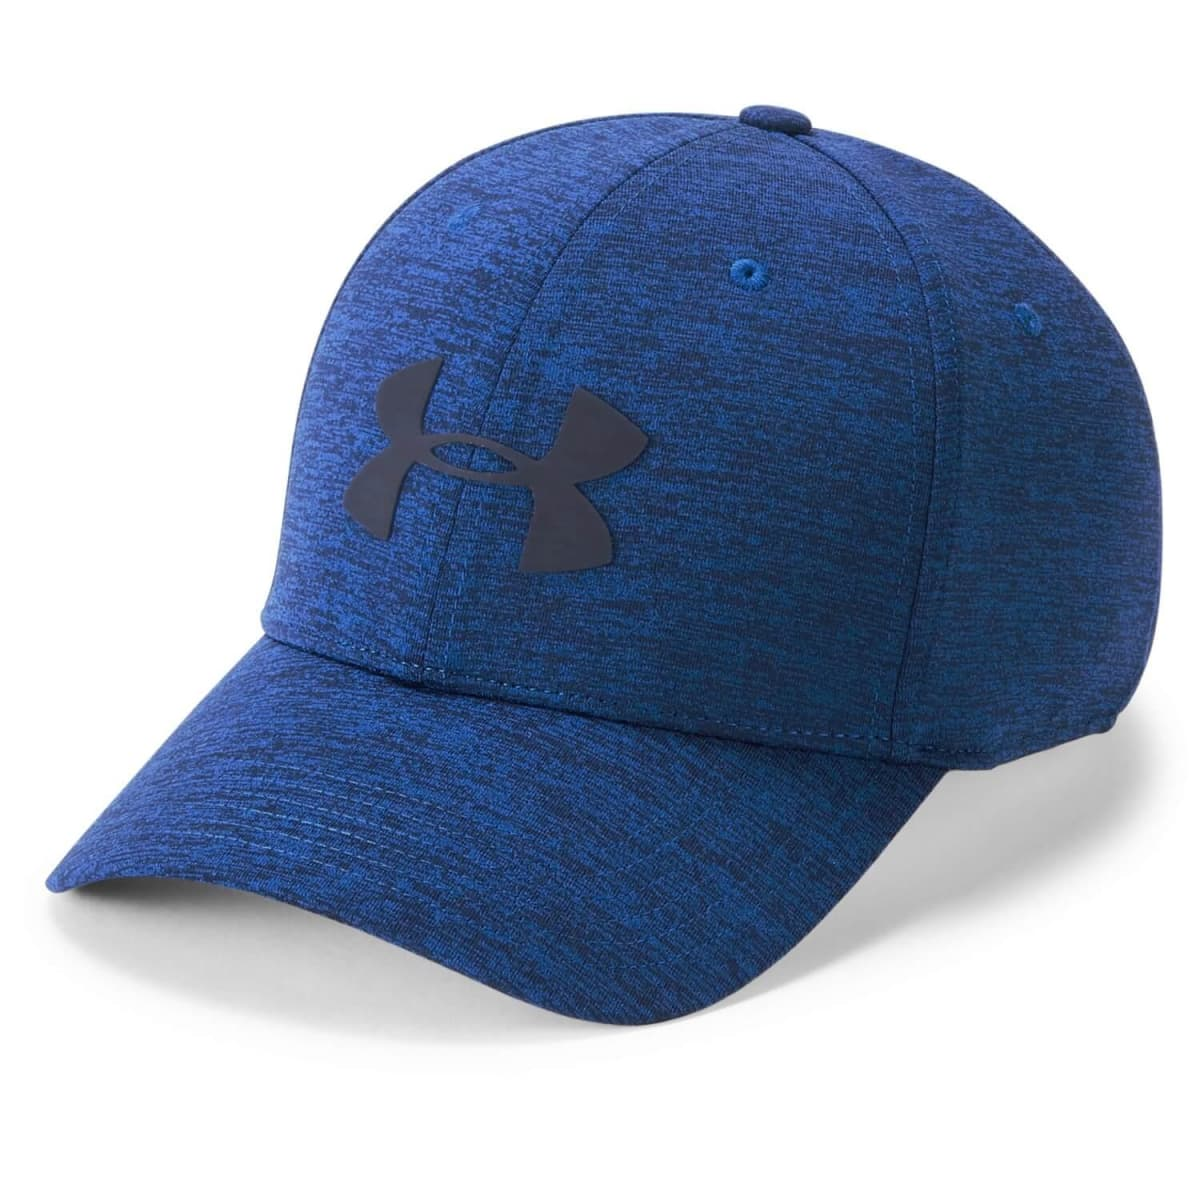 purchase cheap 23ed8 39c61 UA Men s Twist Closer Cap 2.0